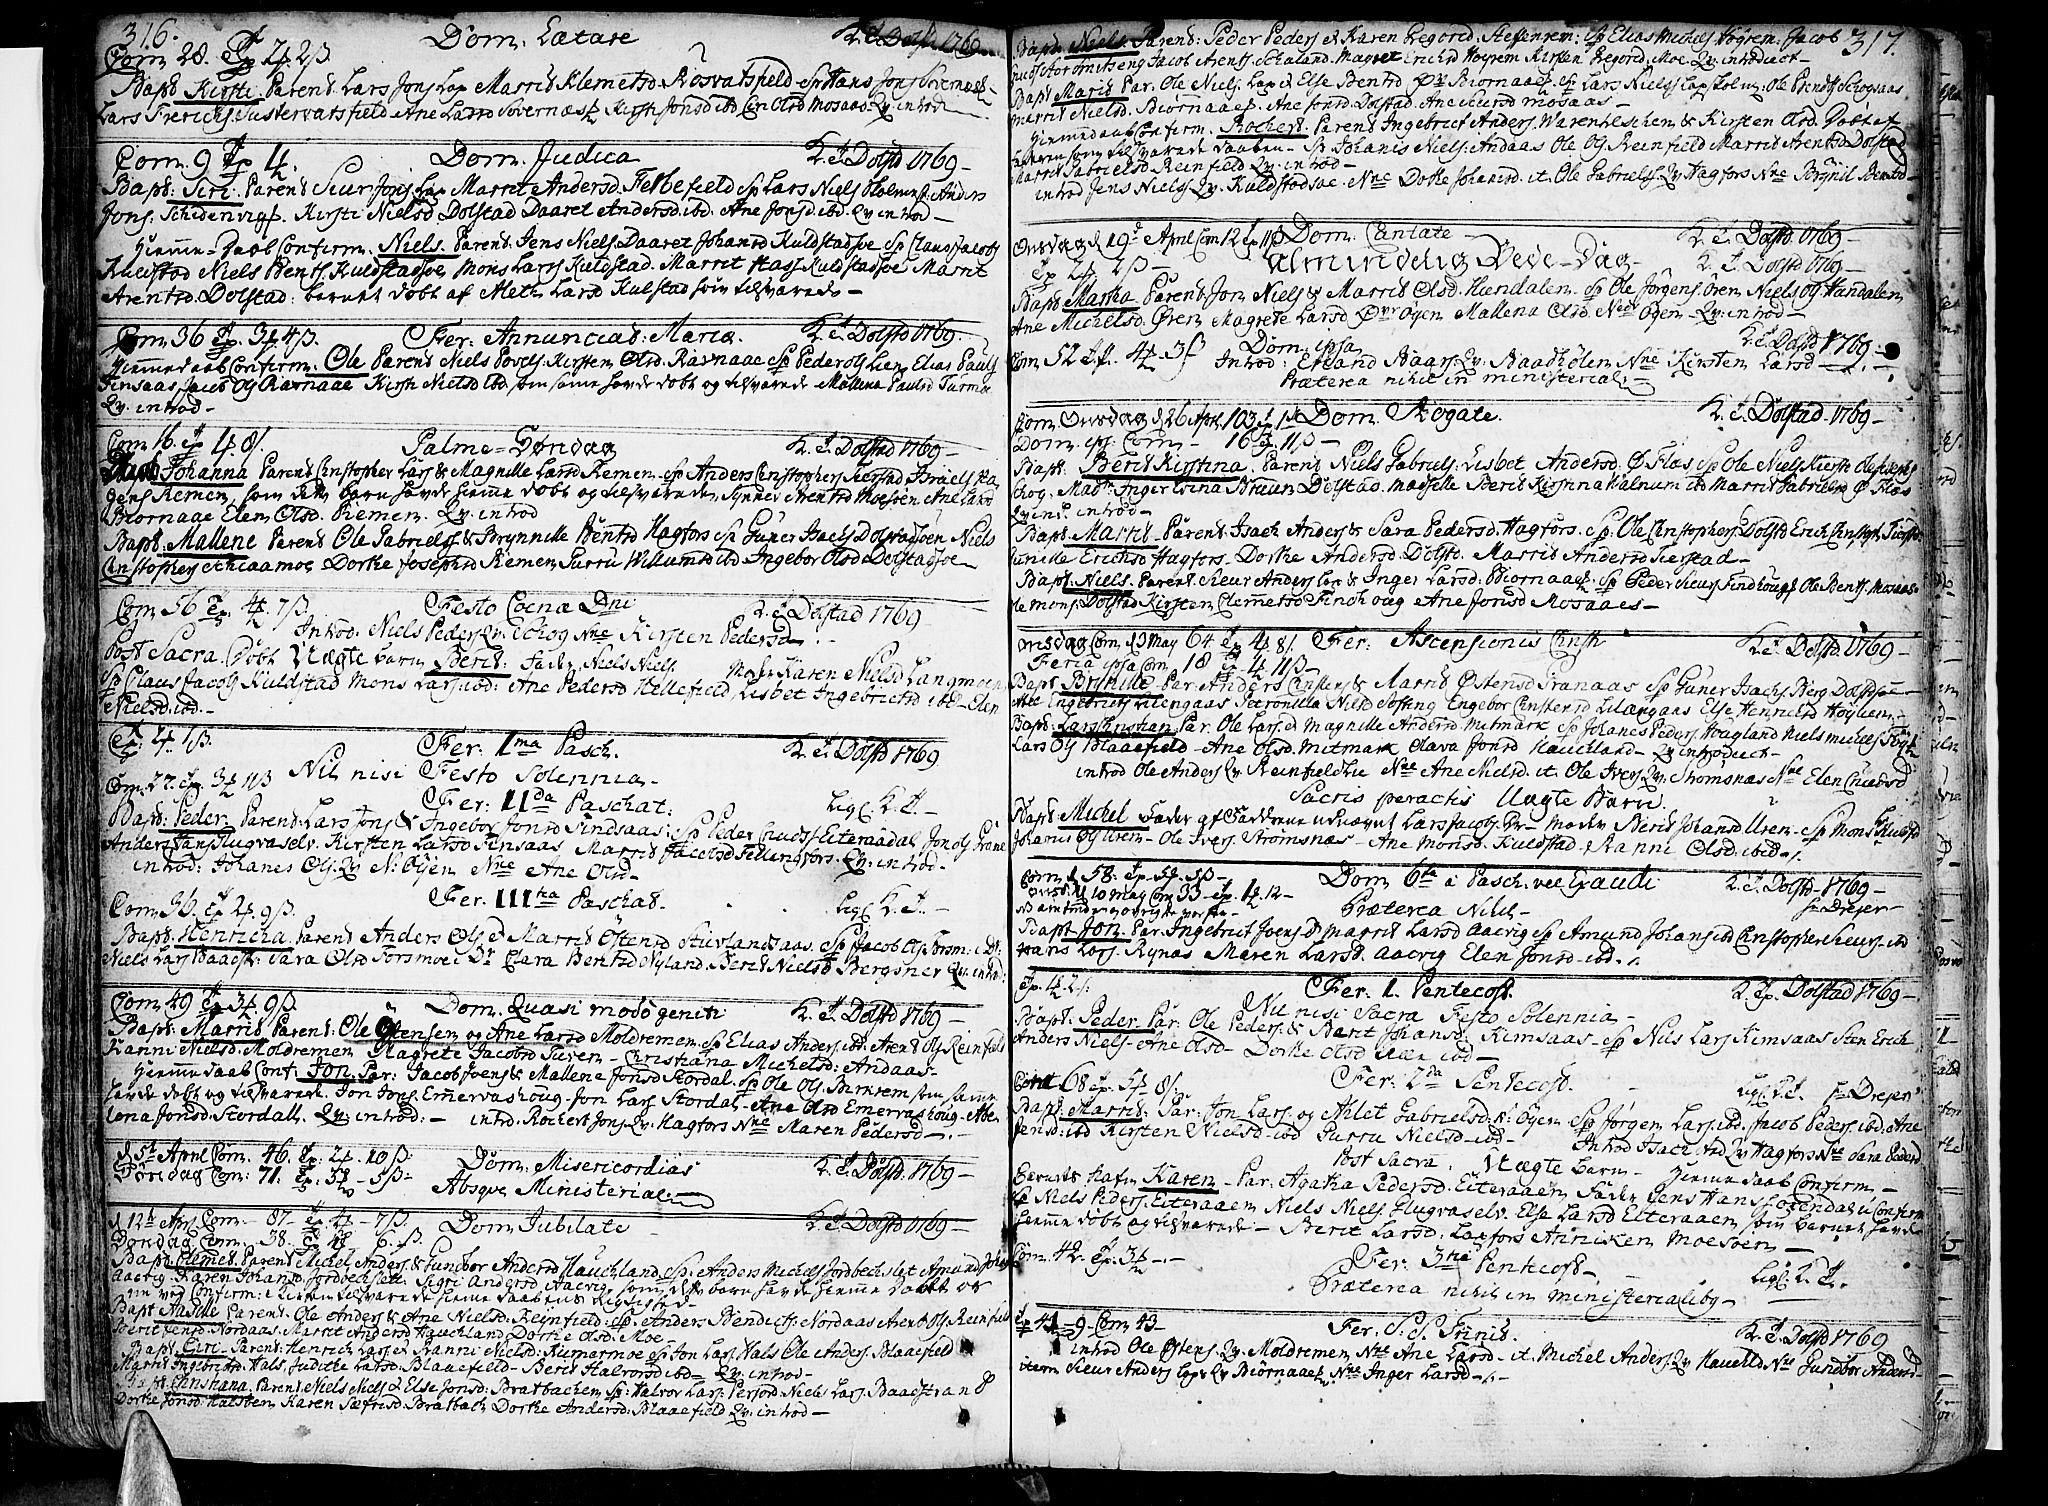 SAT, Ministerialprotokoller, klokkerbøker og fødselsregistre - Nordland, 820/L0285: Ministerialbok nr. 820A06, 1753-1778, s. 316-317